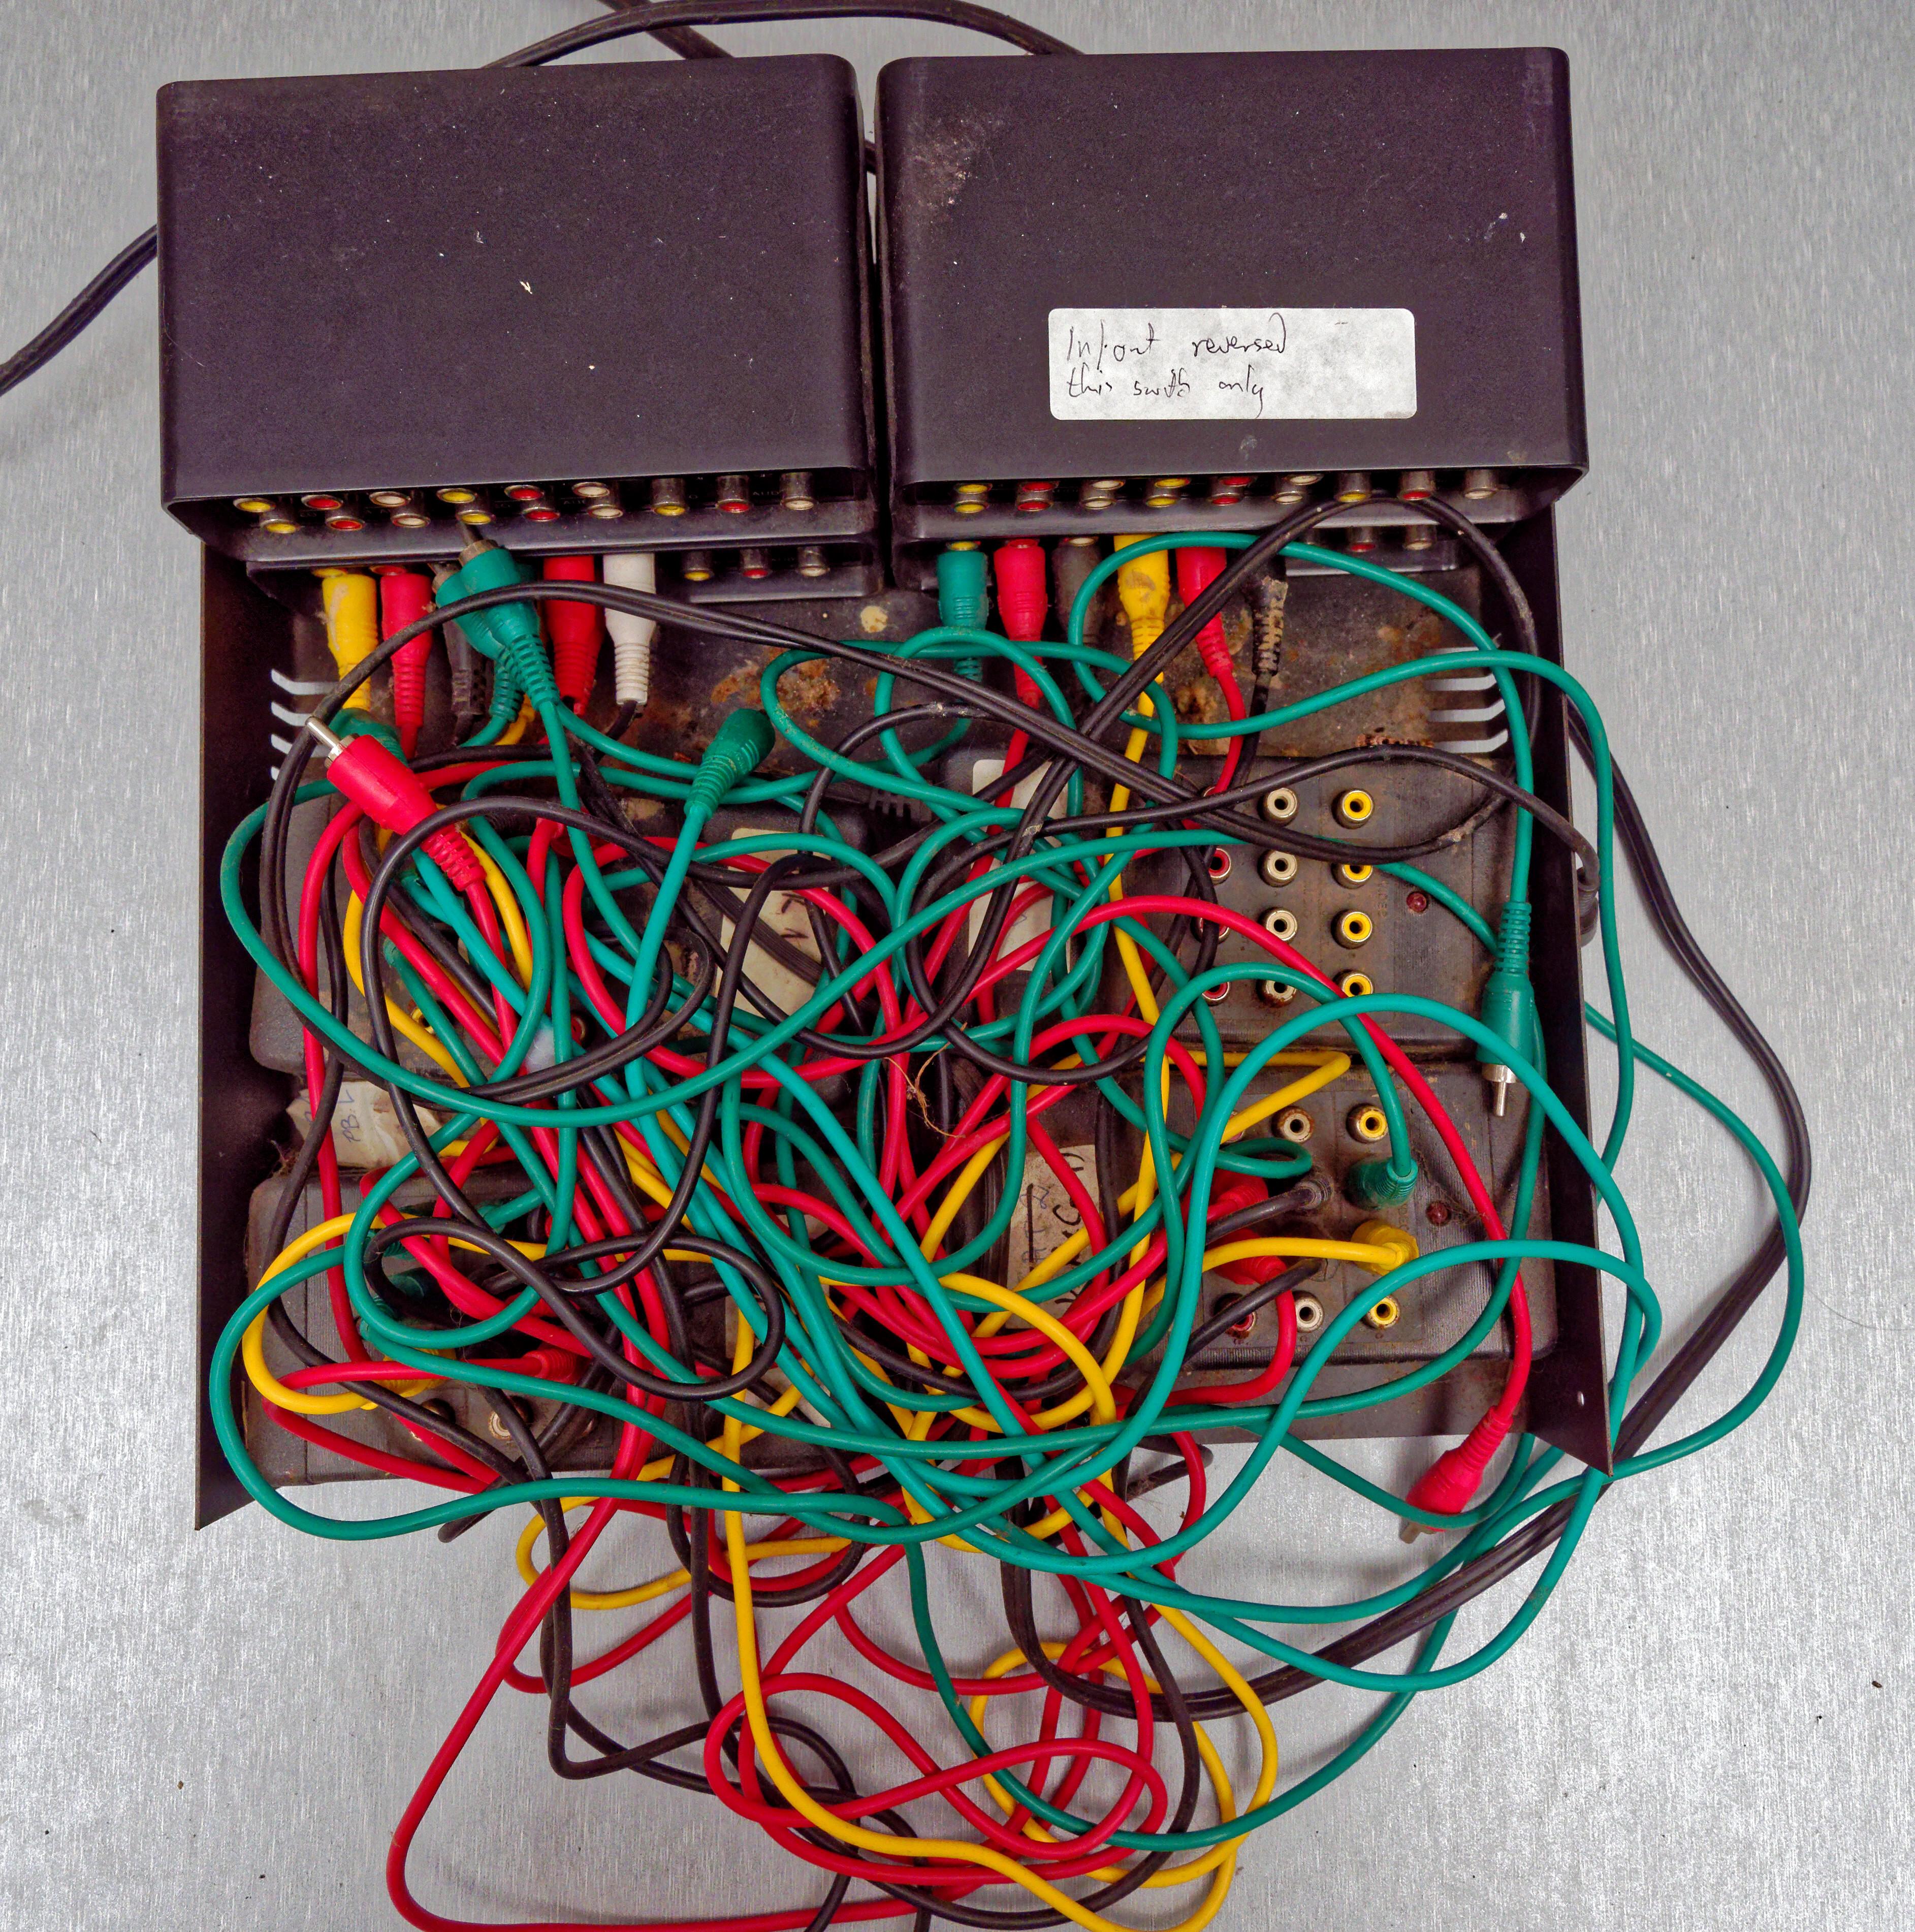 Junction-box-6.jpeg